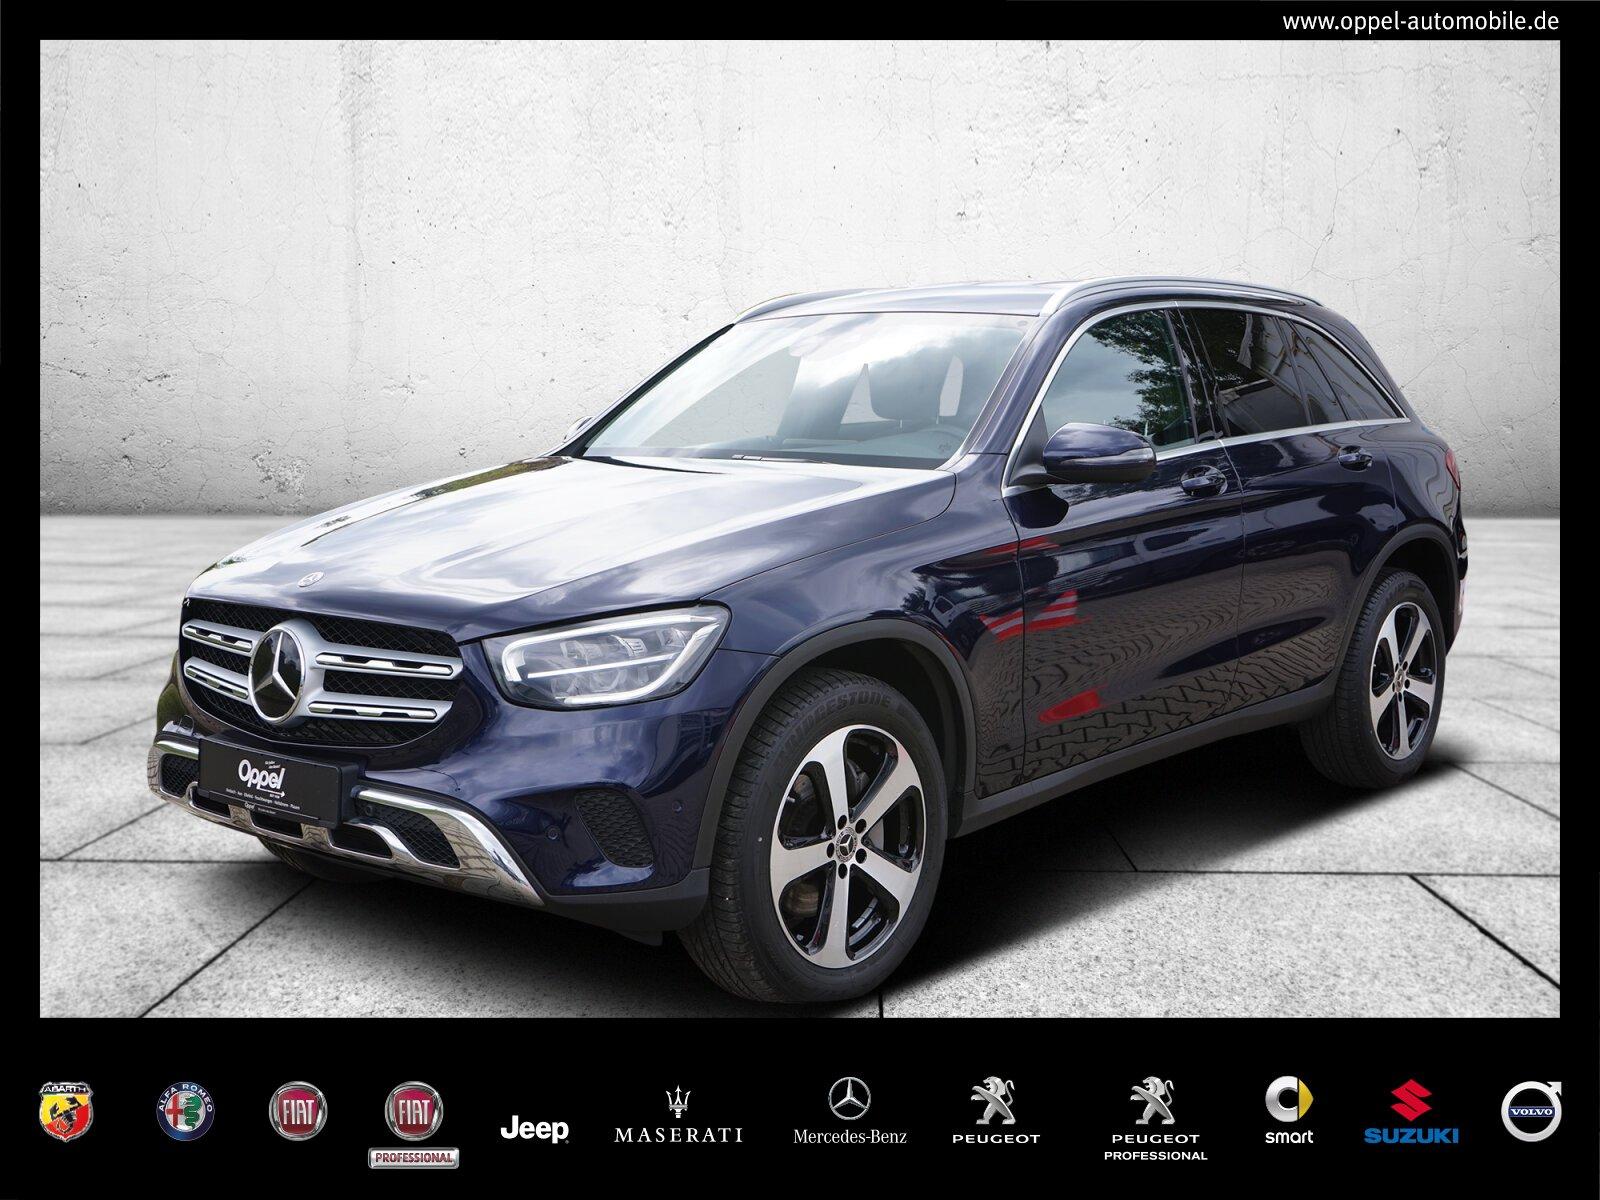 Mercedes-Benz GLC 300 d 4M DISTRONIC PLUS+AHK+KAMERA+NAVI+LED, Jahr 2020, Diesel